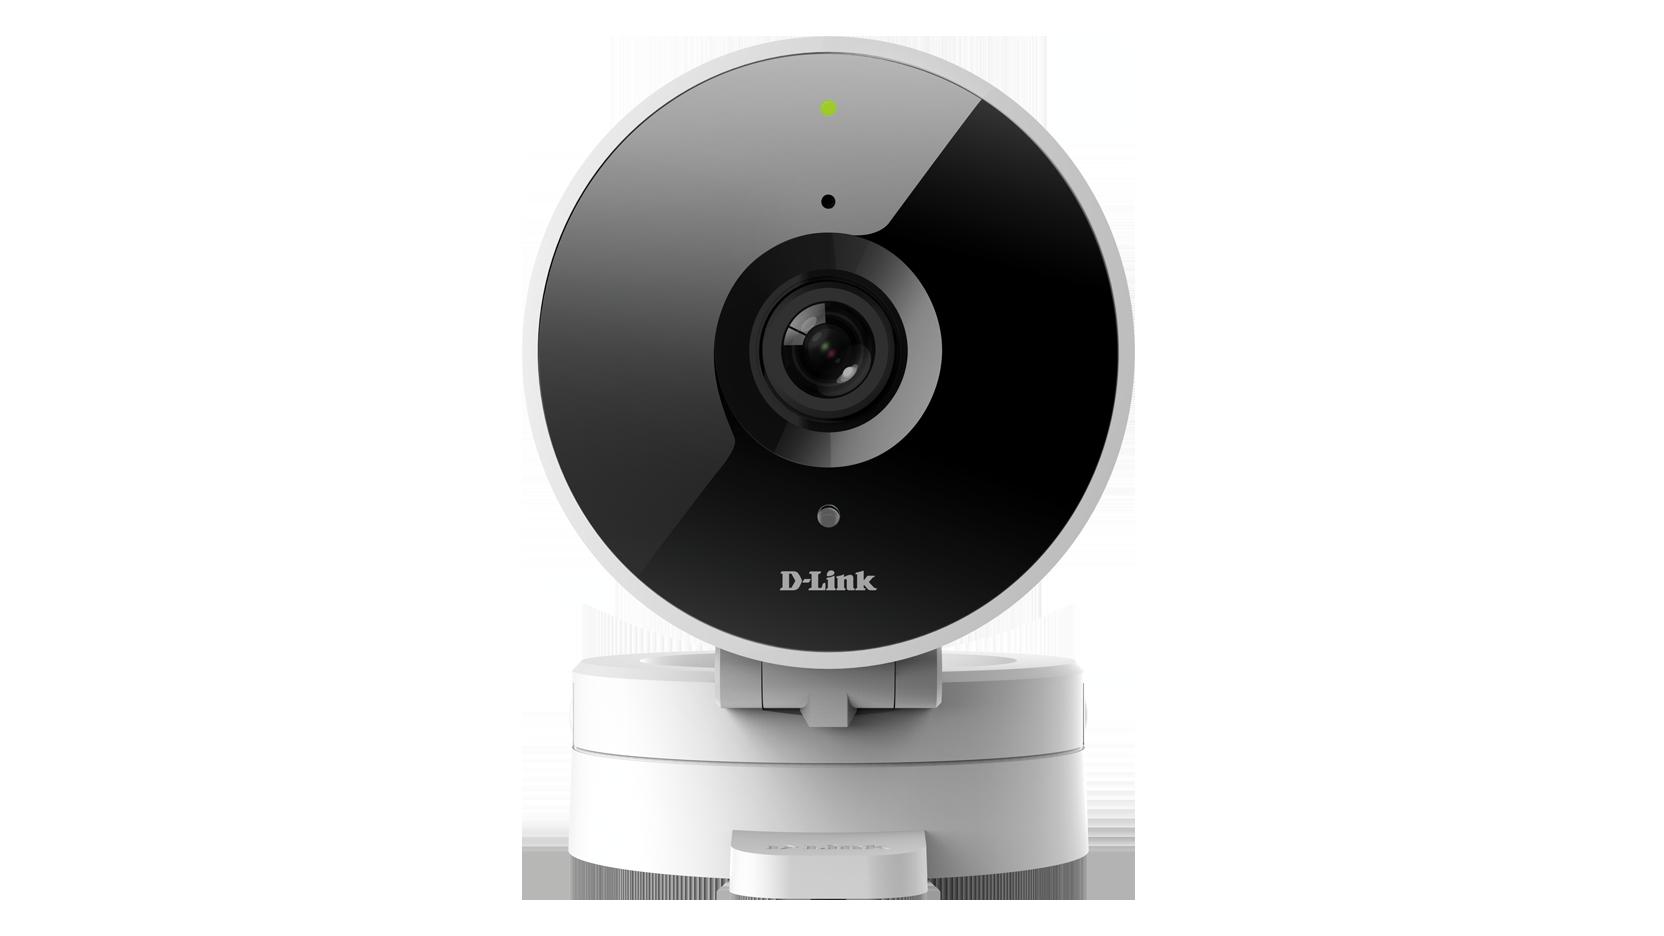 D-Link DCS-8010LH mydlink HD Wi-Fi Camera - DCS-8010LH